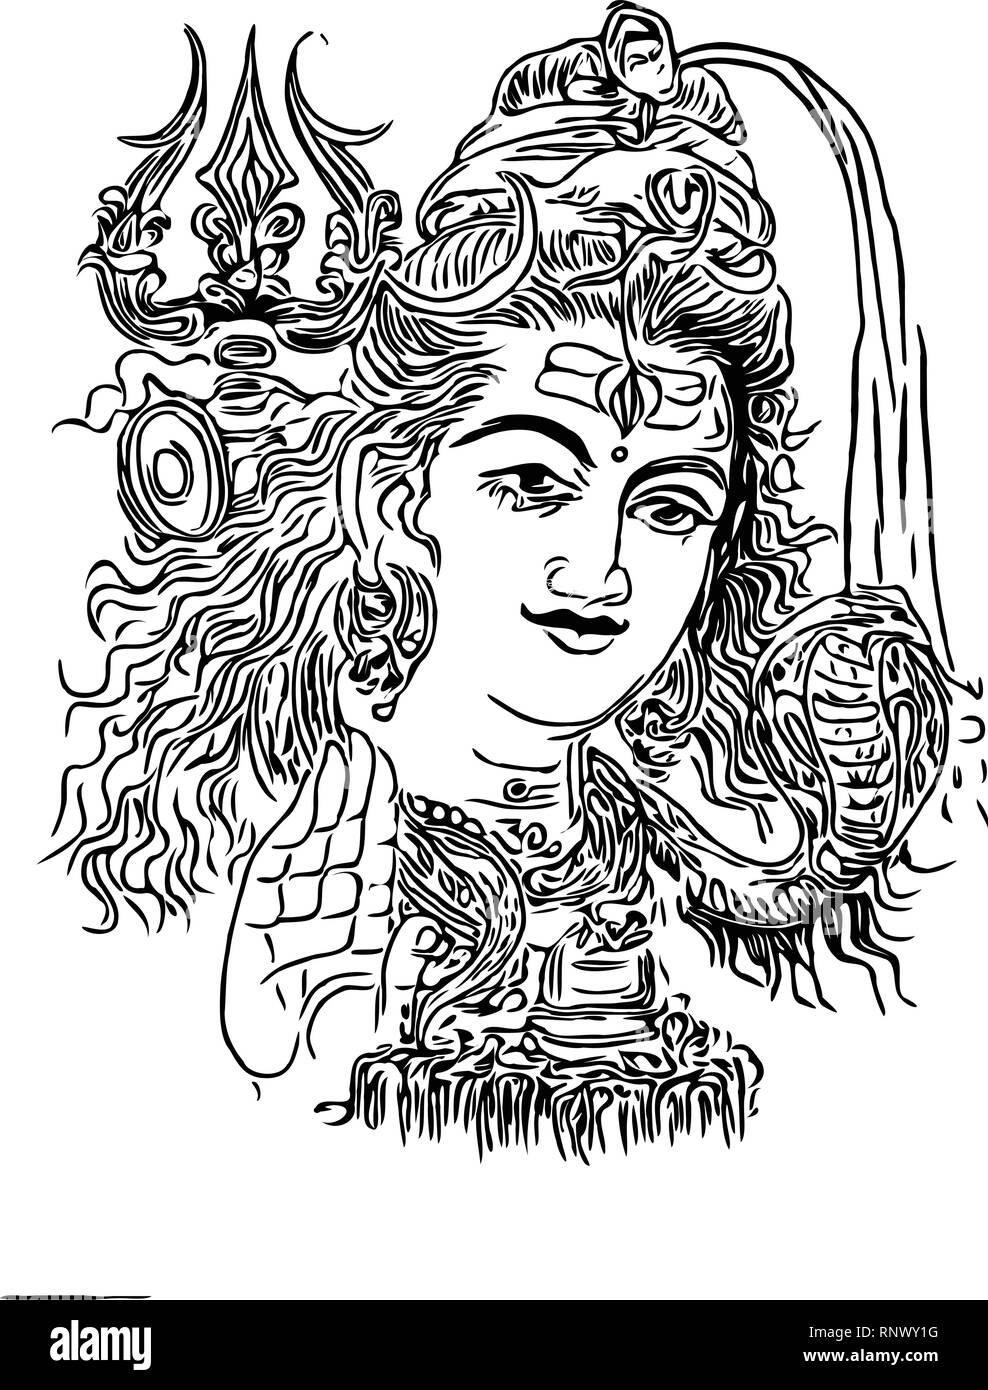 illustration of Lord Shiva, Indian God -Vector - Stock Image